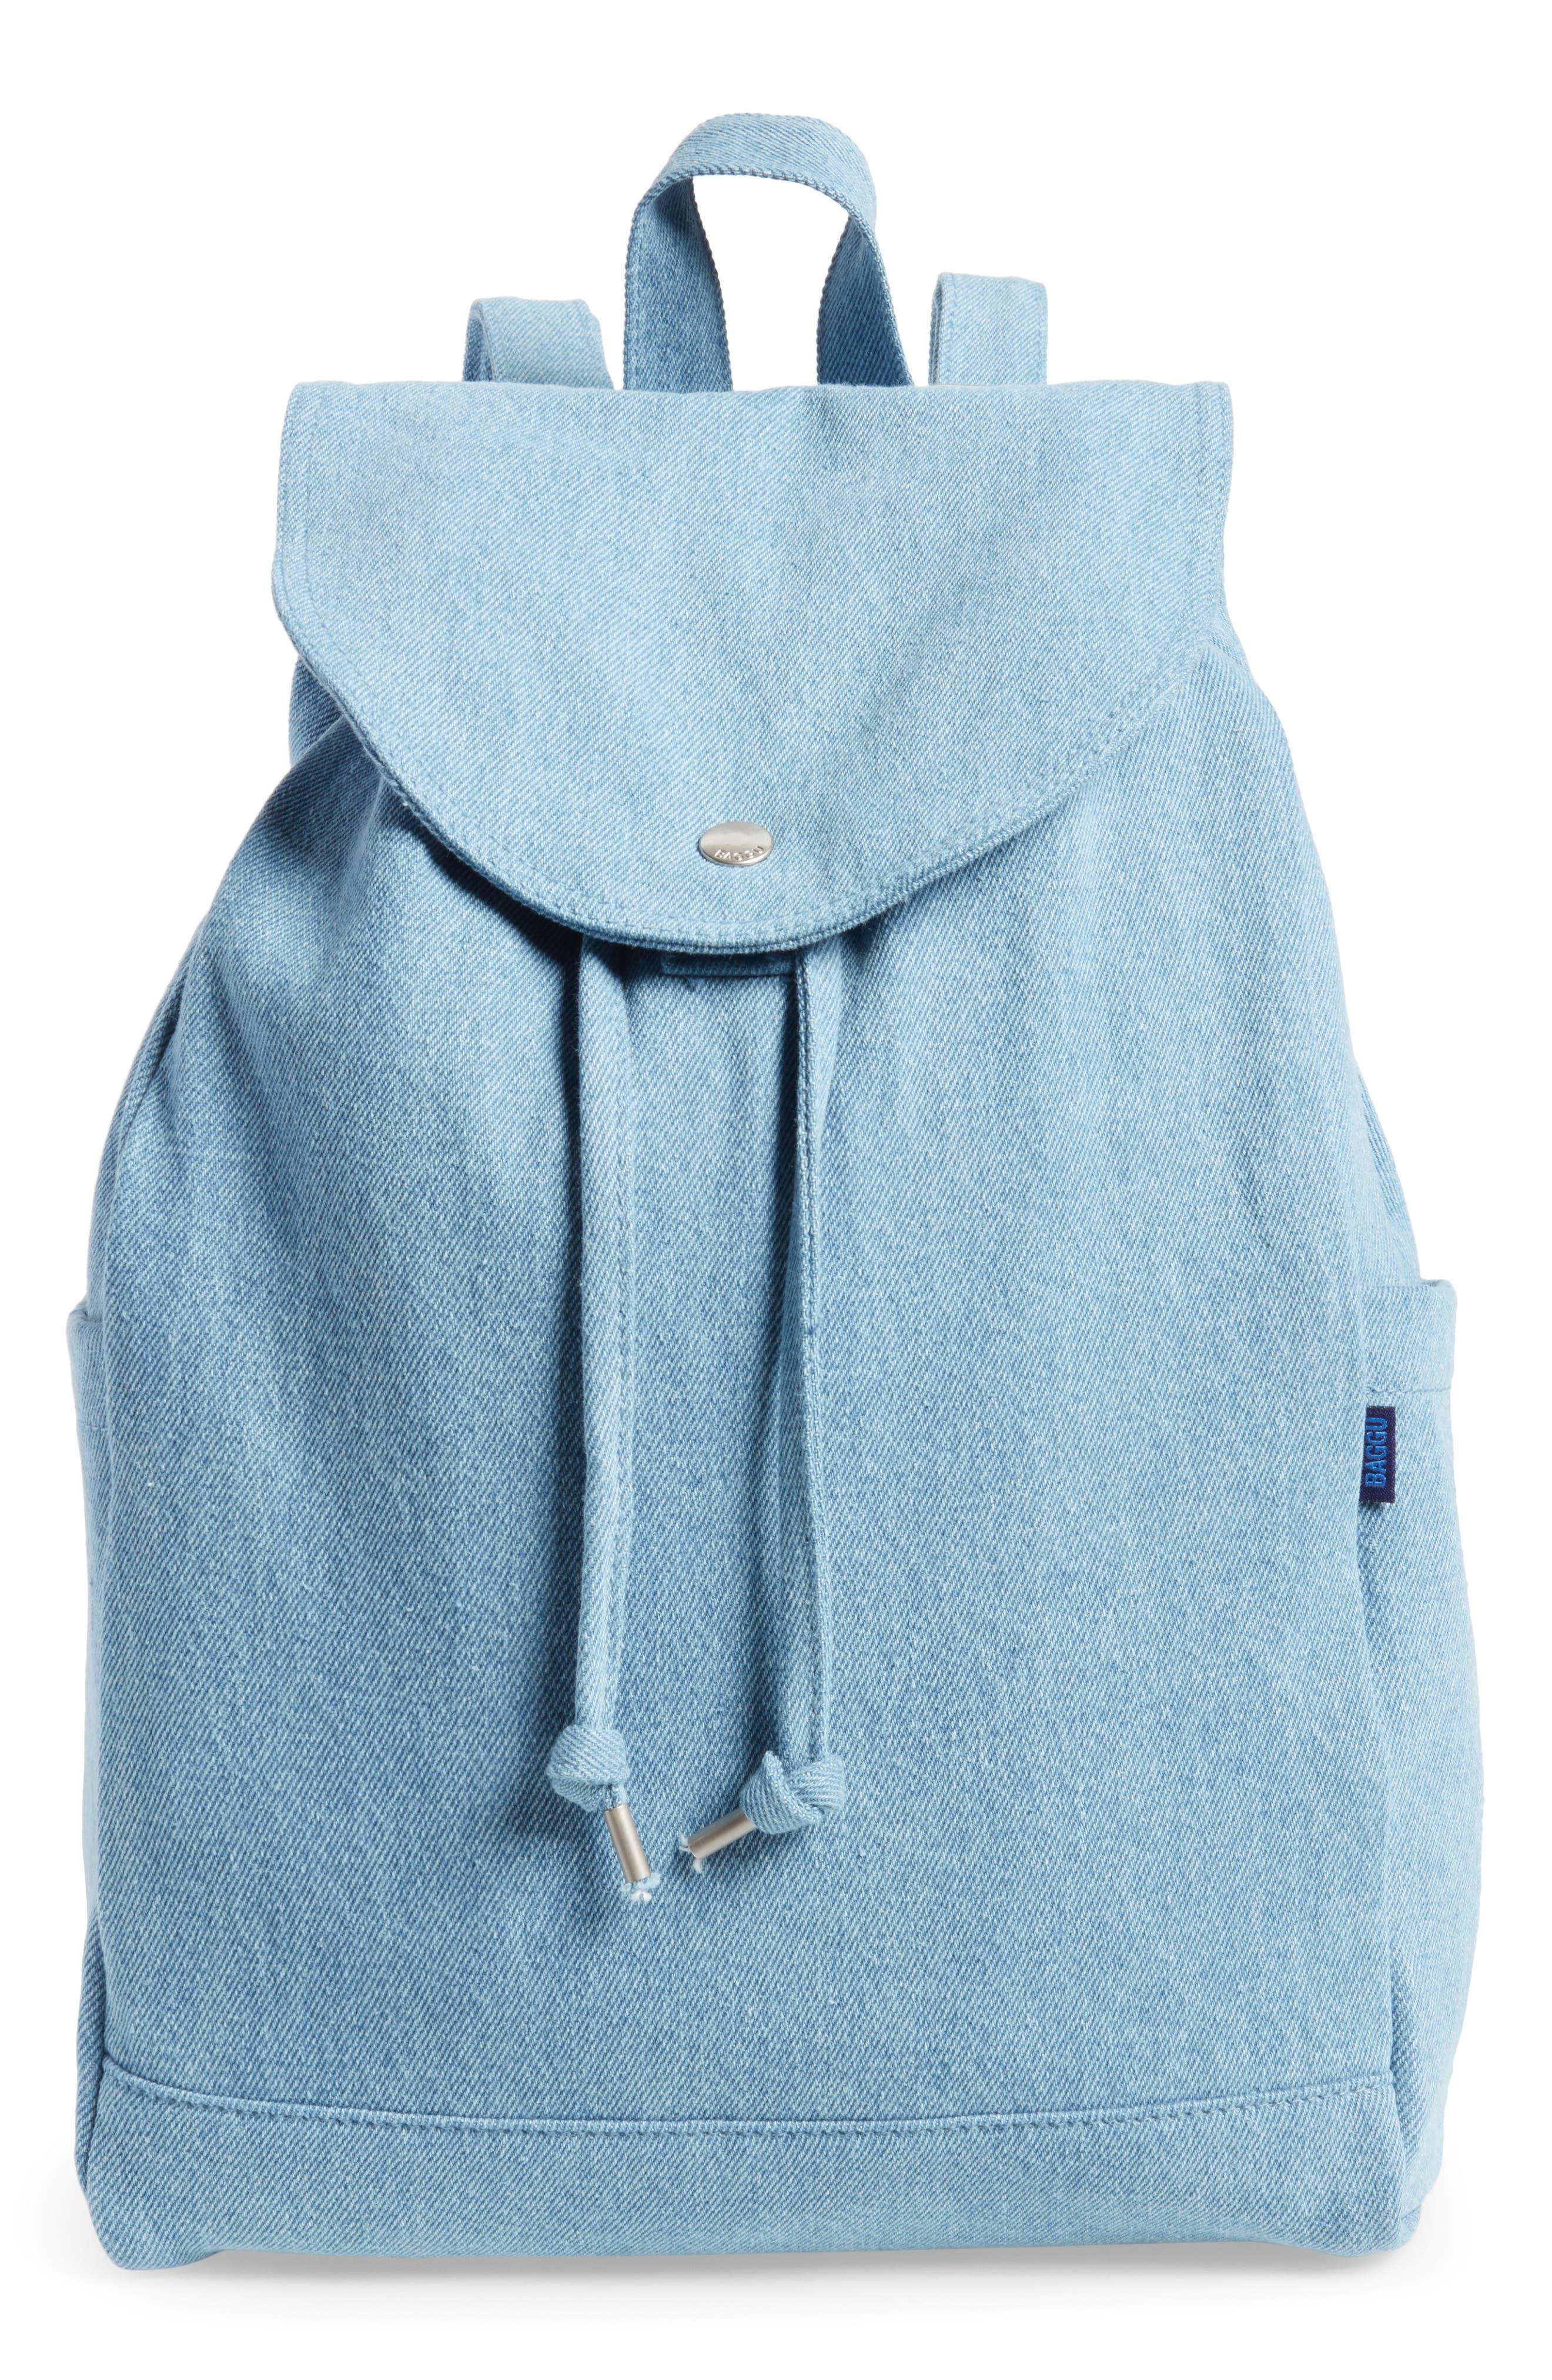 Drawstring Canvas Backpack,                         Main,                         color, Washed Denim